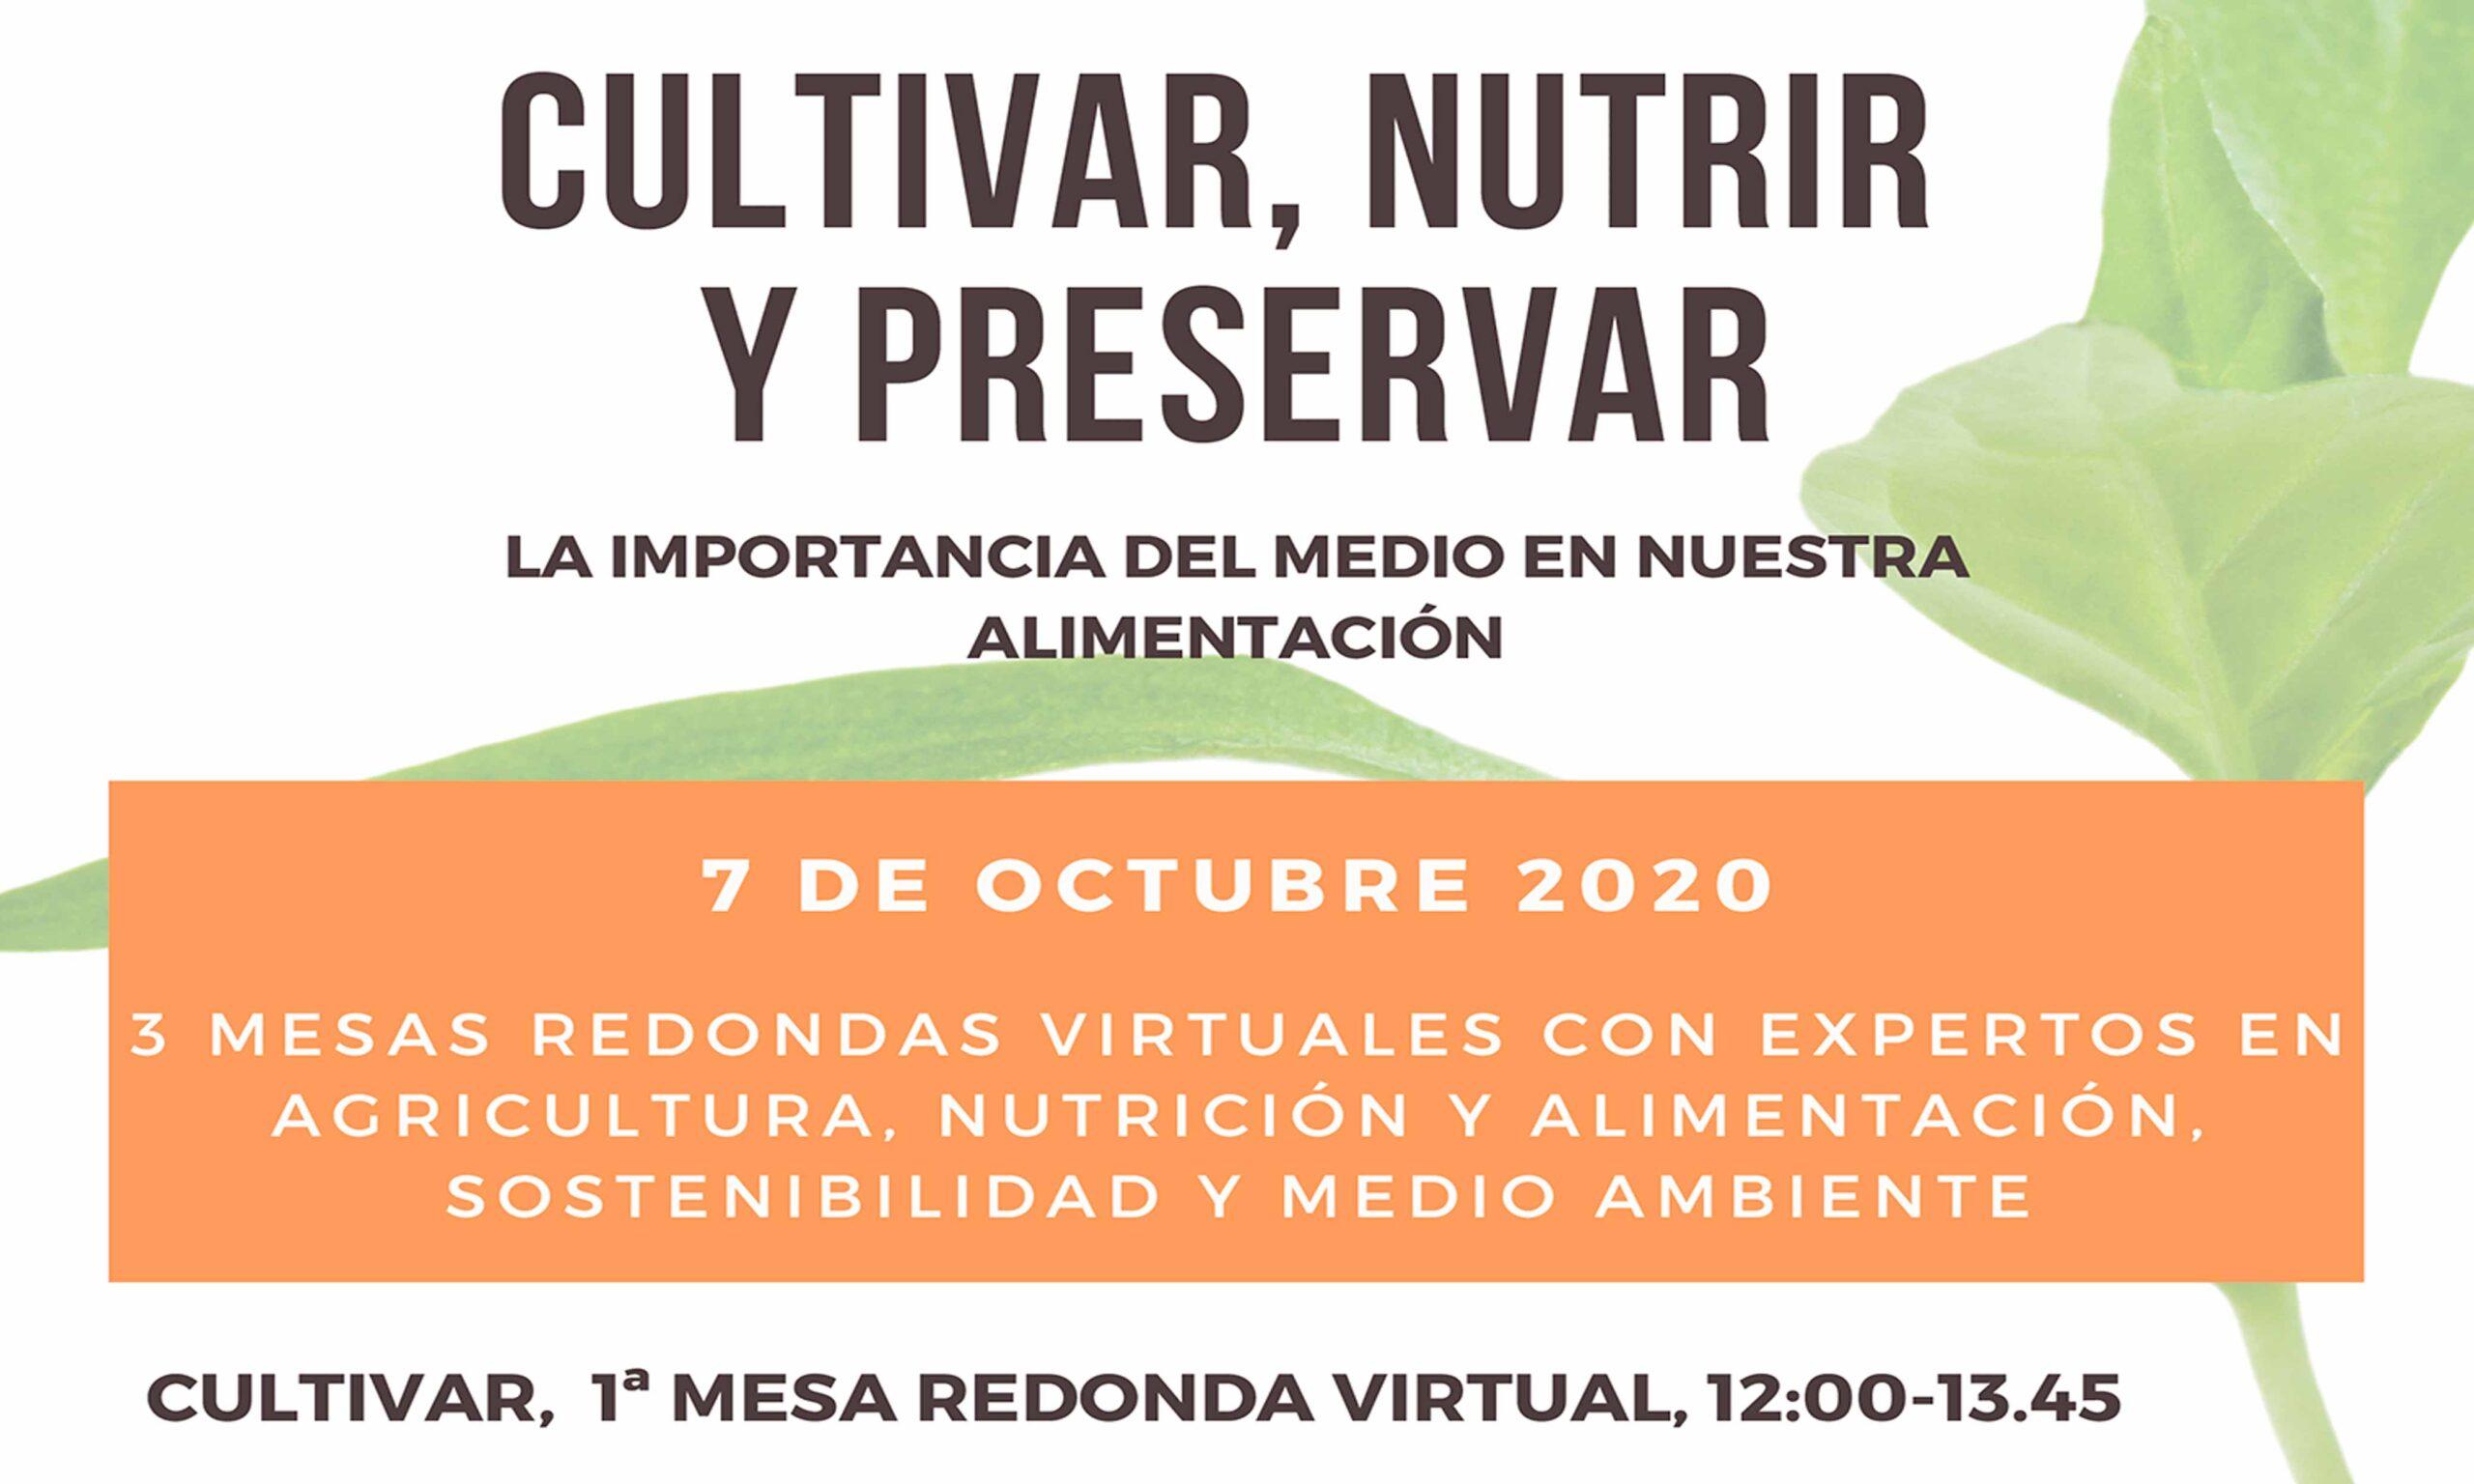 Cultivar, nutrir y preservar